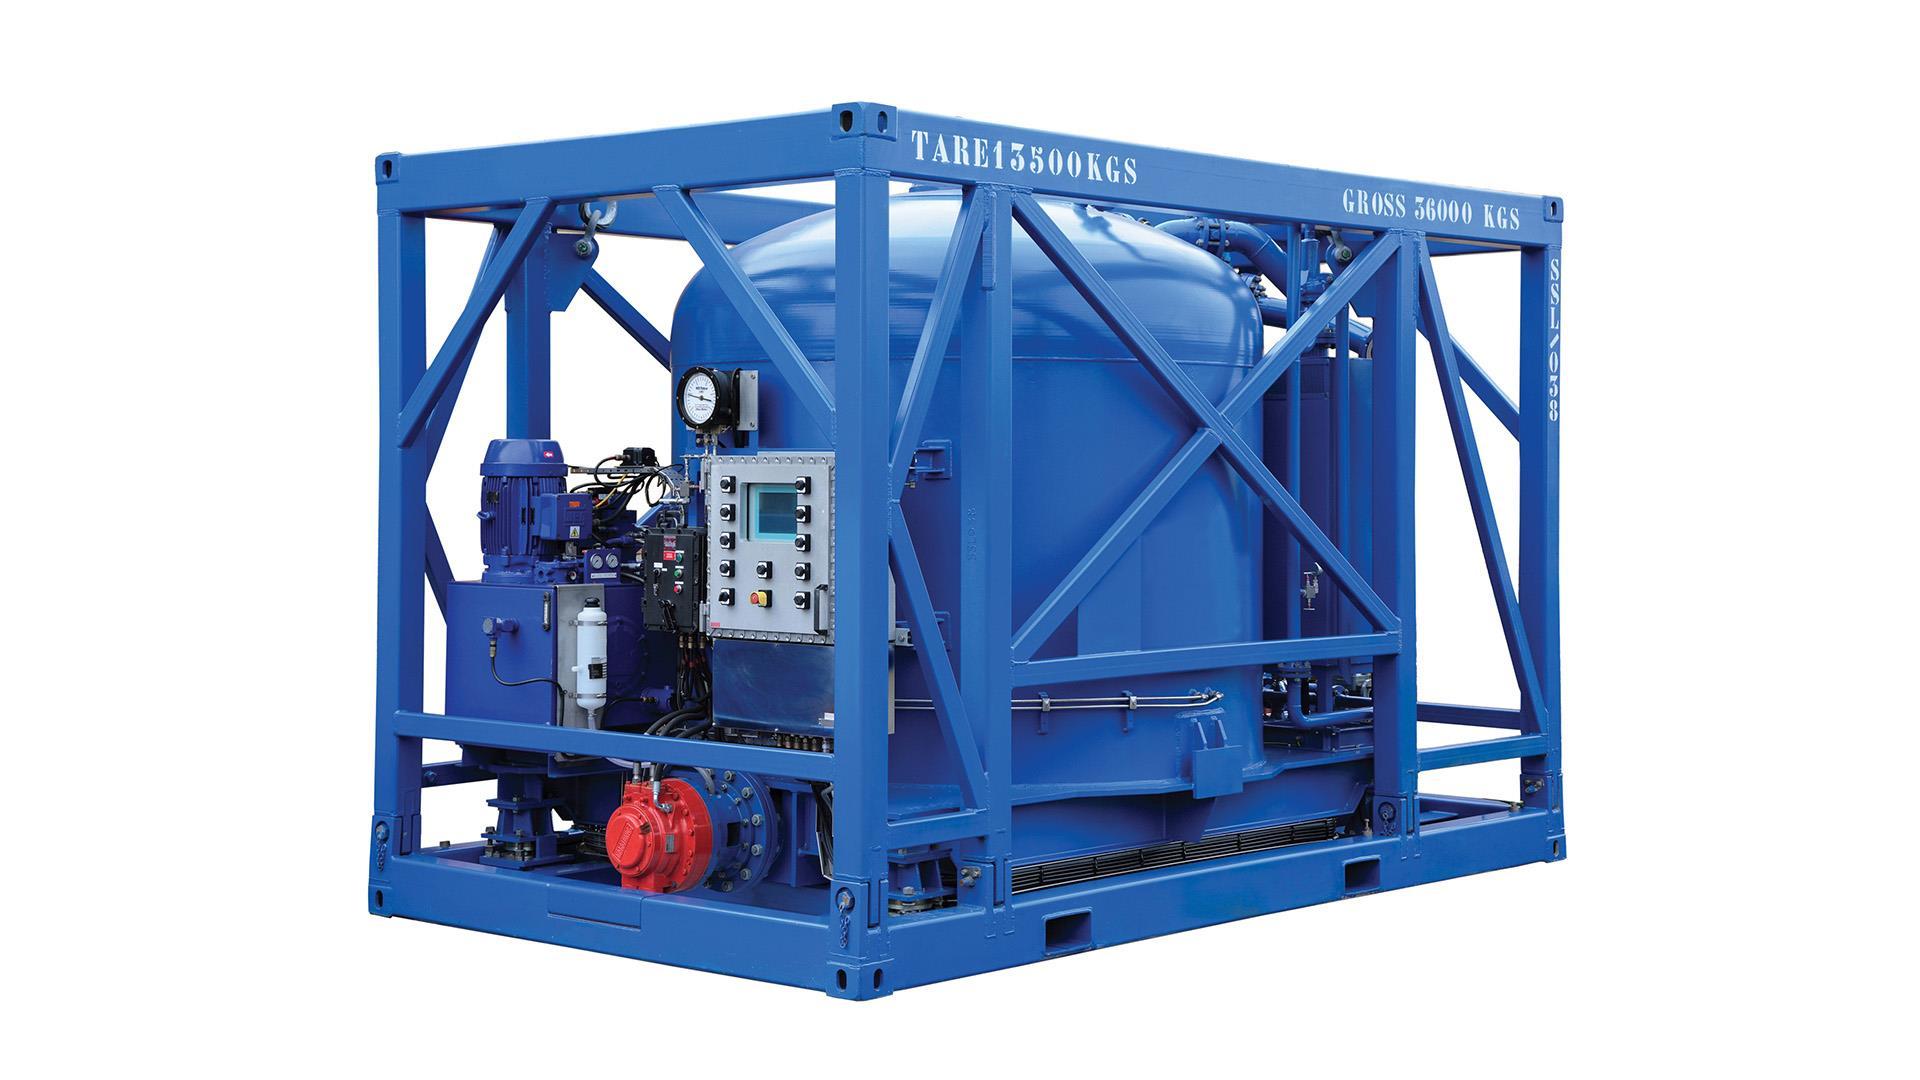 Render of Slider Storage and Discharge Vessels